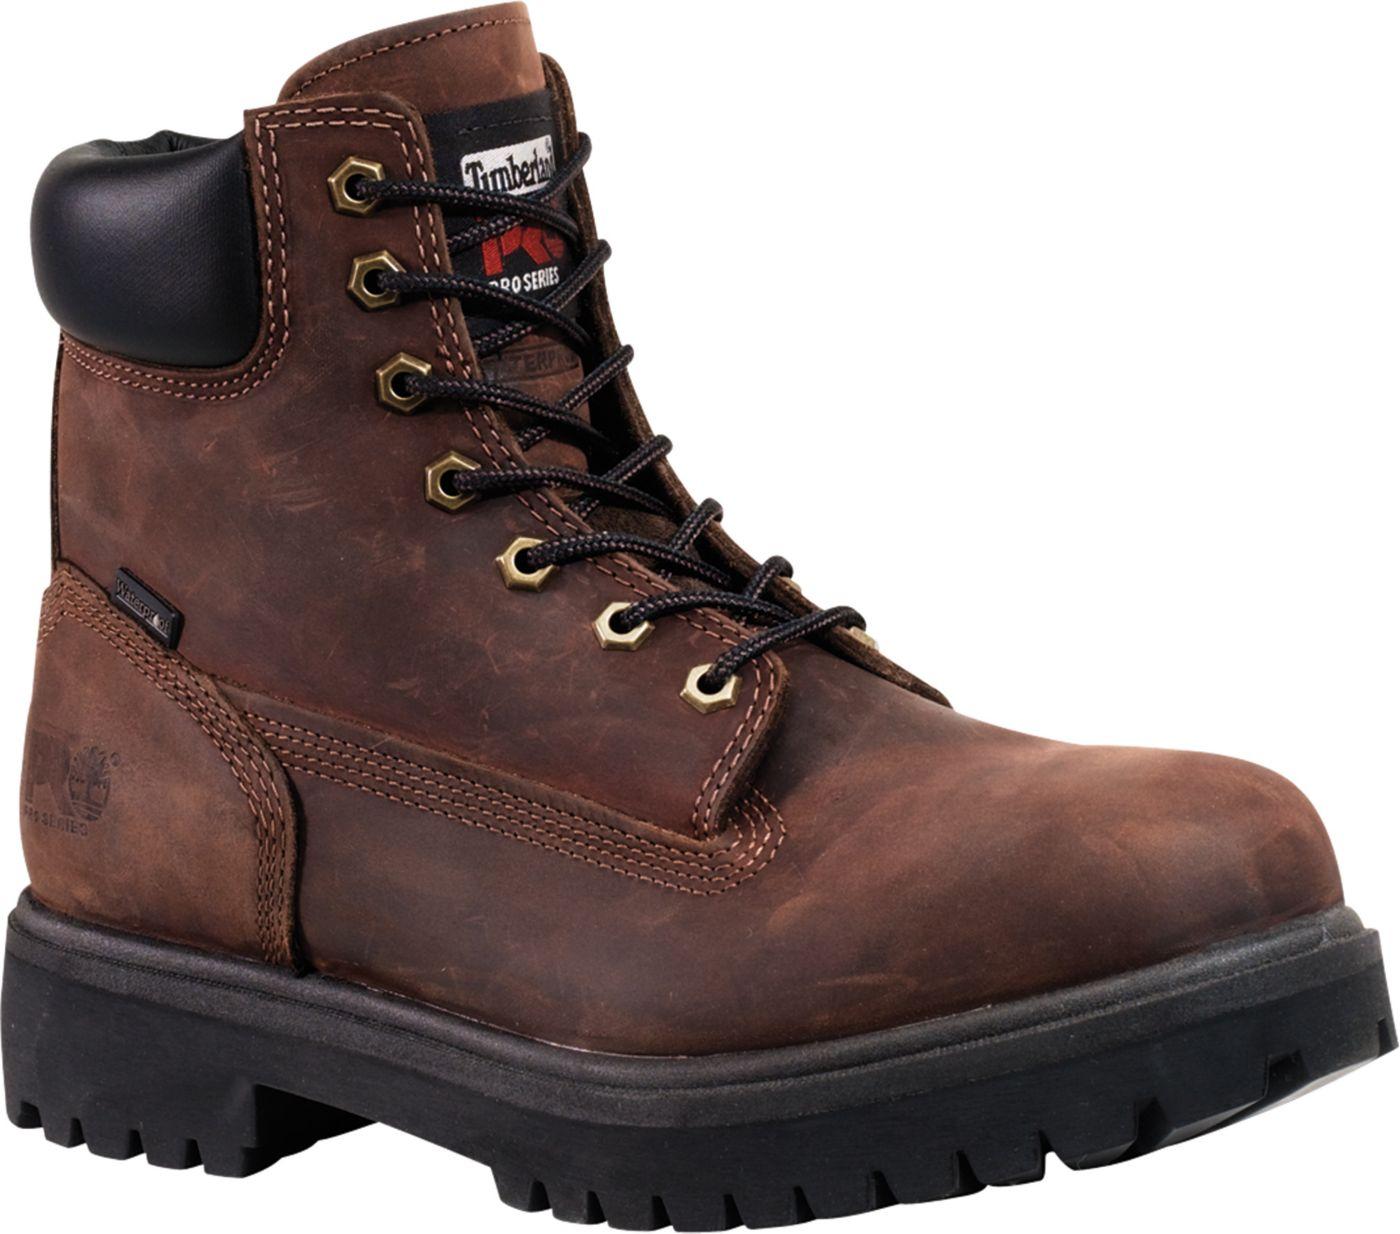 Timberland PRO Men's Direct Attach 6'' 200g Waterproof Steel Toe Work Boots